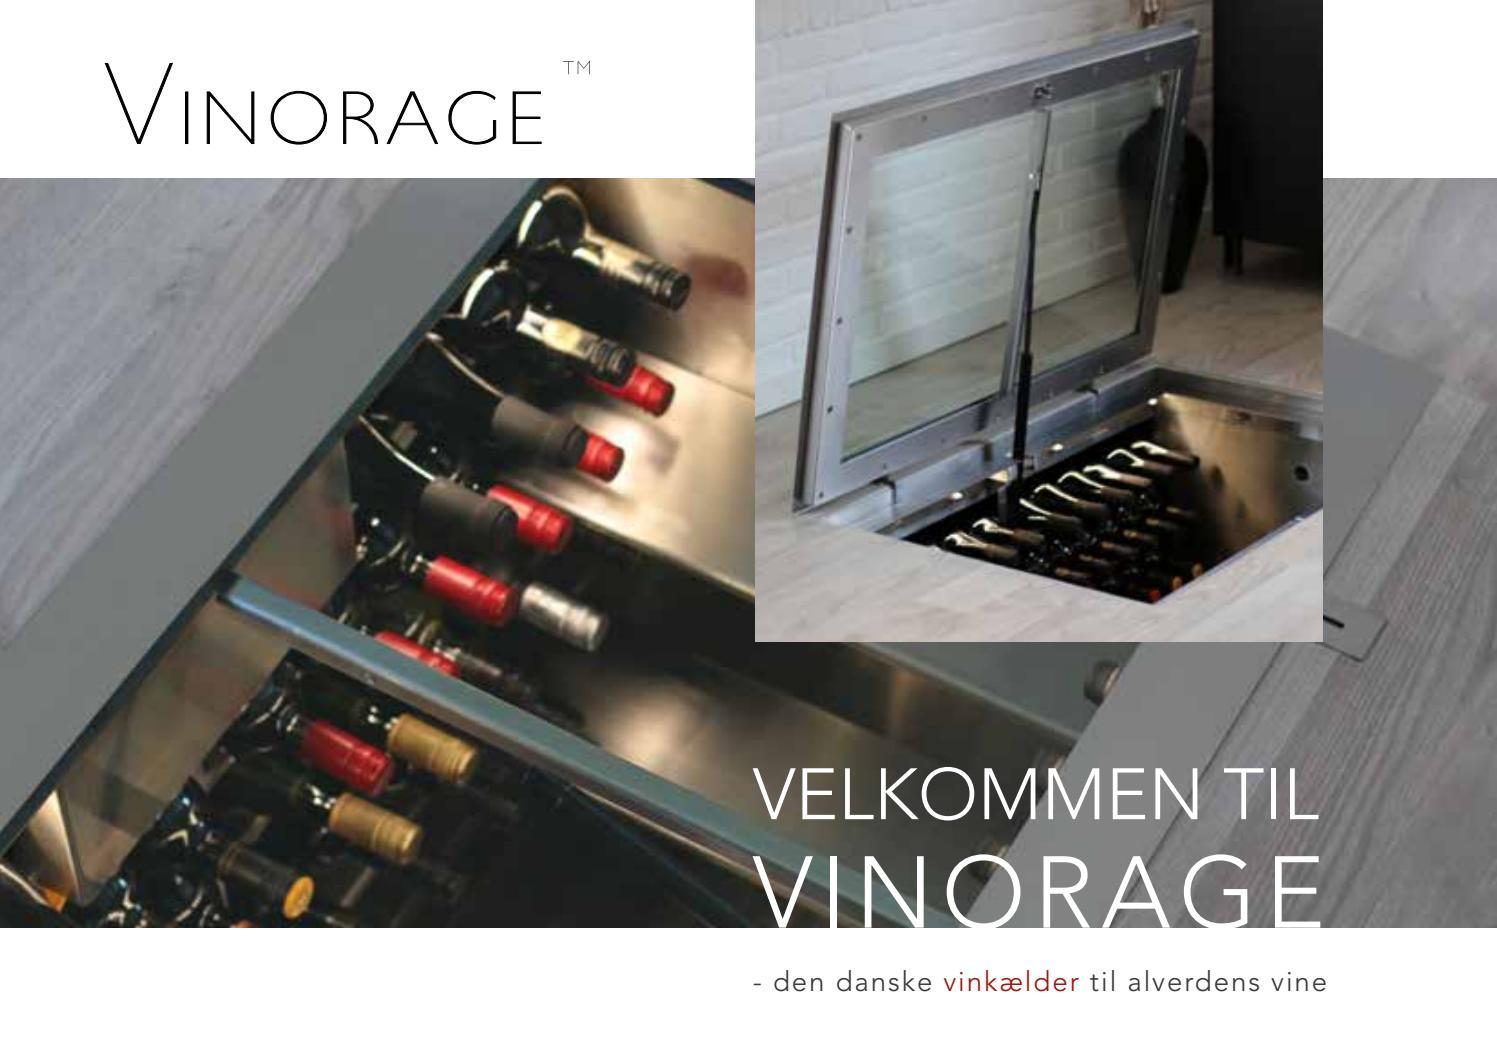 Picture of: Vinorage By Bettina Kjaer Ringtved Issuu